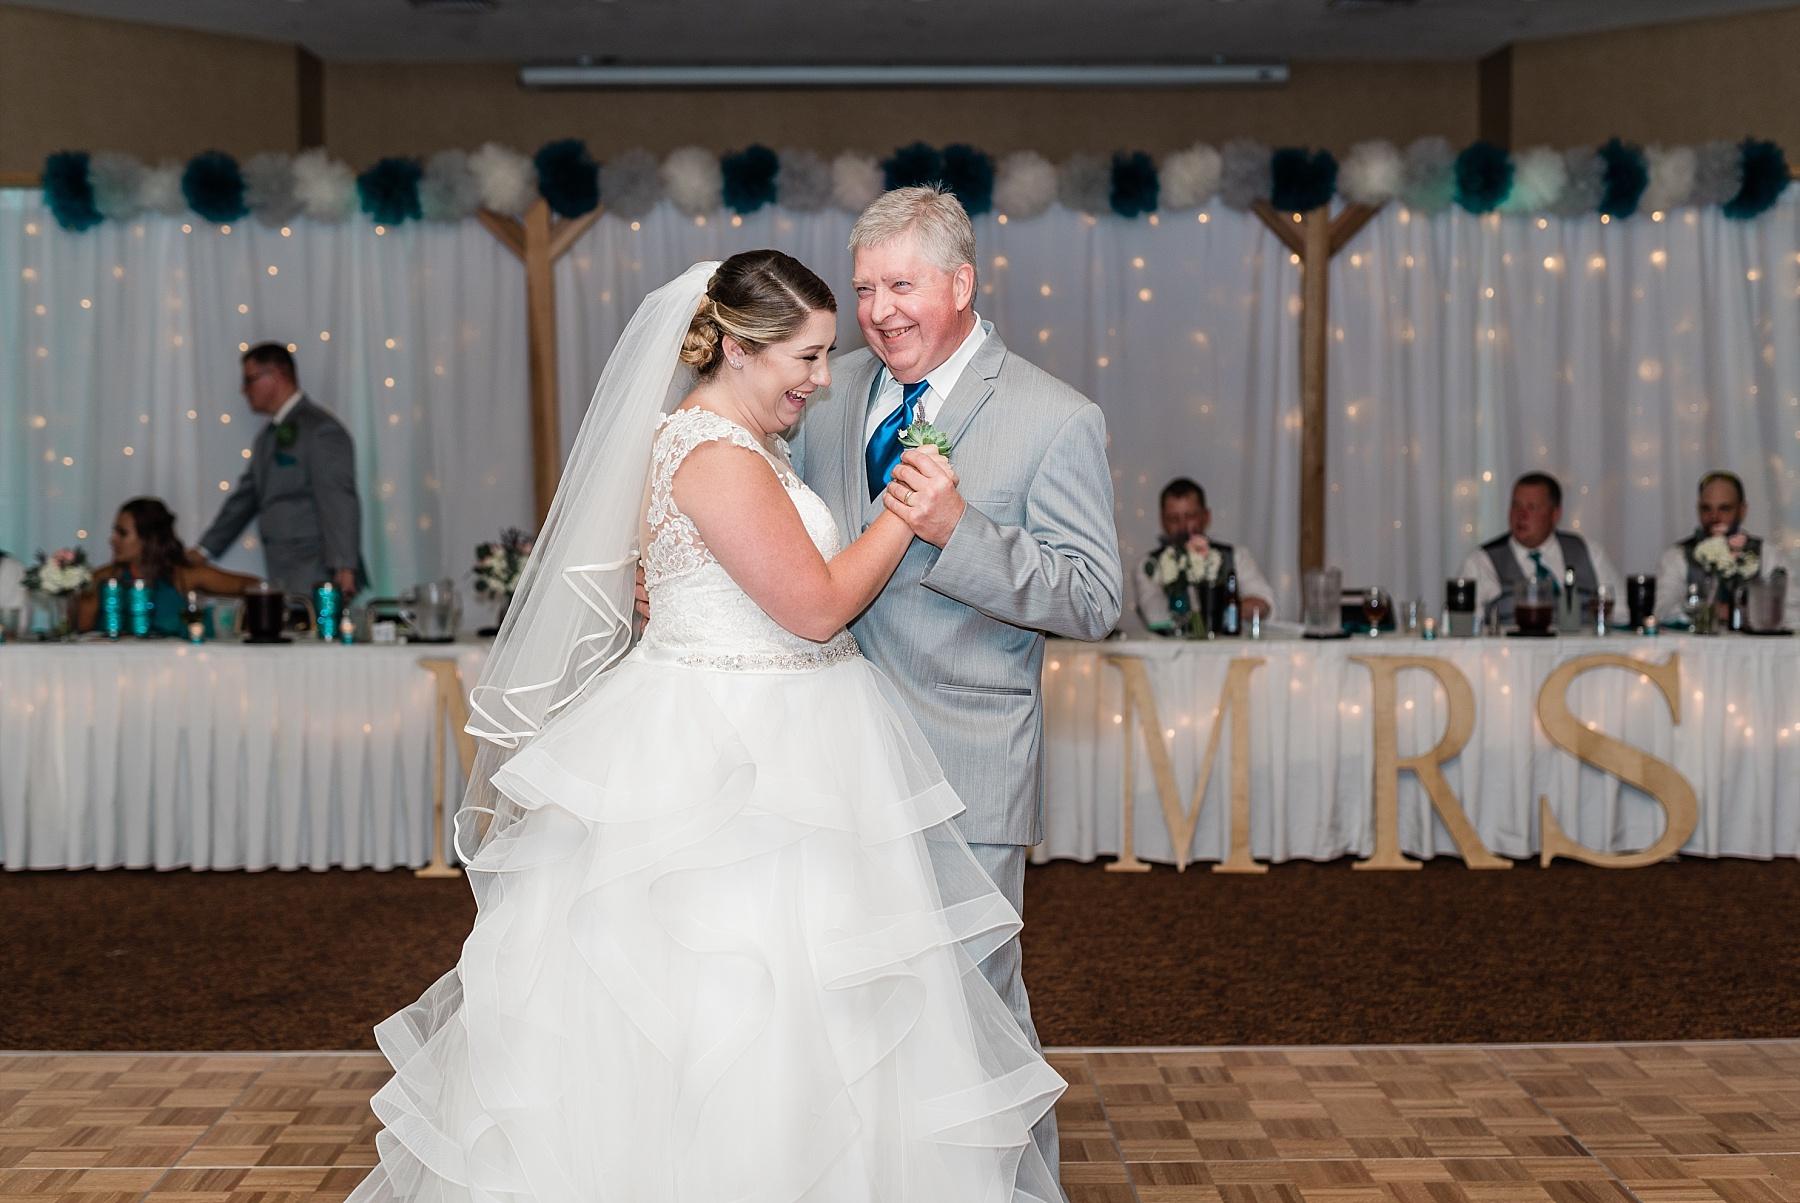 Baurichter Wedding at Stoney Creek Inn Columbia Missouri by Kelsi Kliethermes Photography_0028.jpg